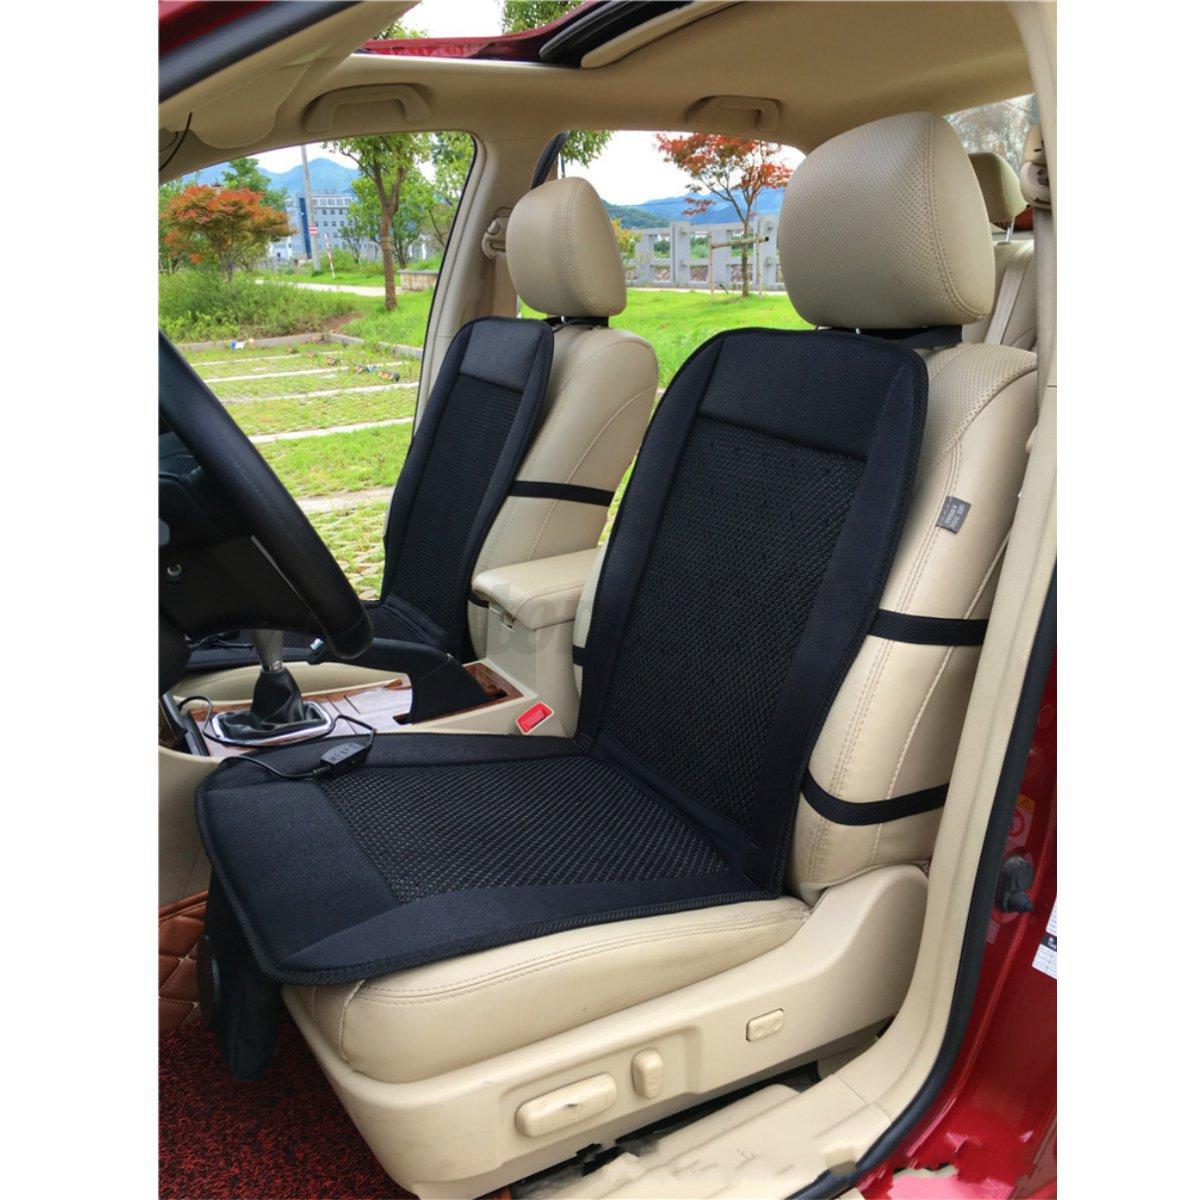 car seat cooler cushion cover summer cooling wind seat chair black cover pad 12v ebay. Black Bedroom Furniture Sets. Home Design Ideas